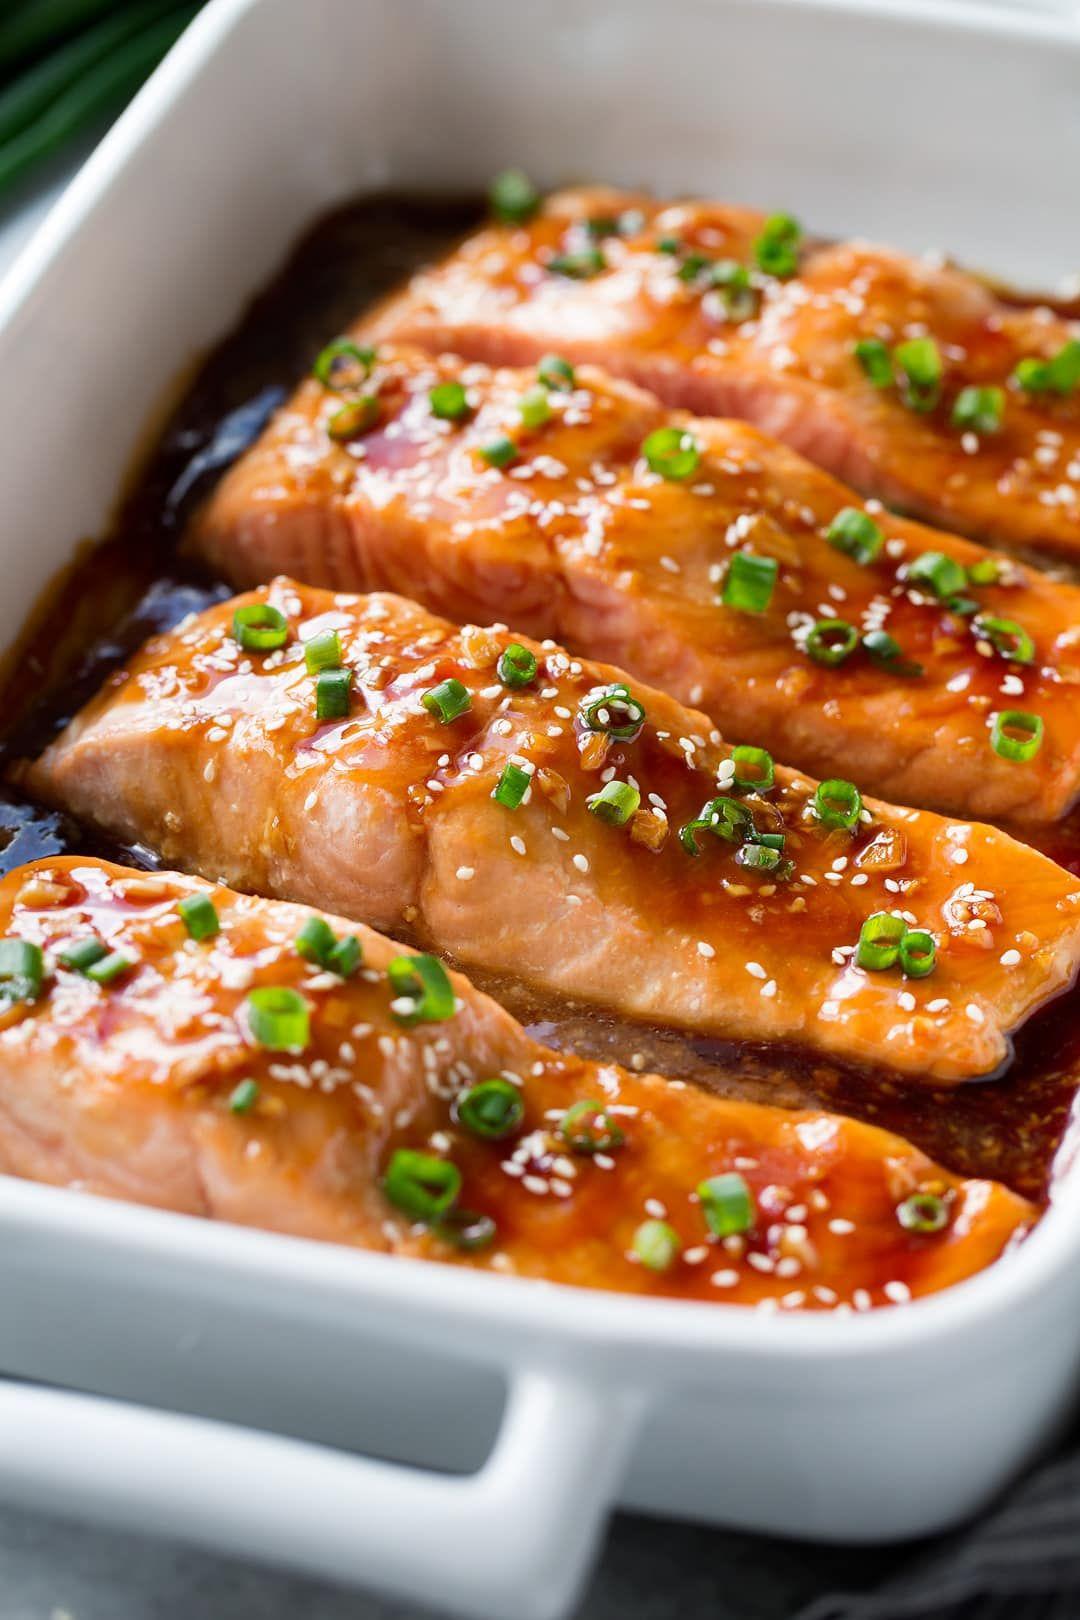 Teriyaki Salmon Recipe - Cooking Classy #teriyakisalmon